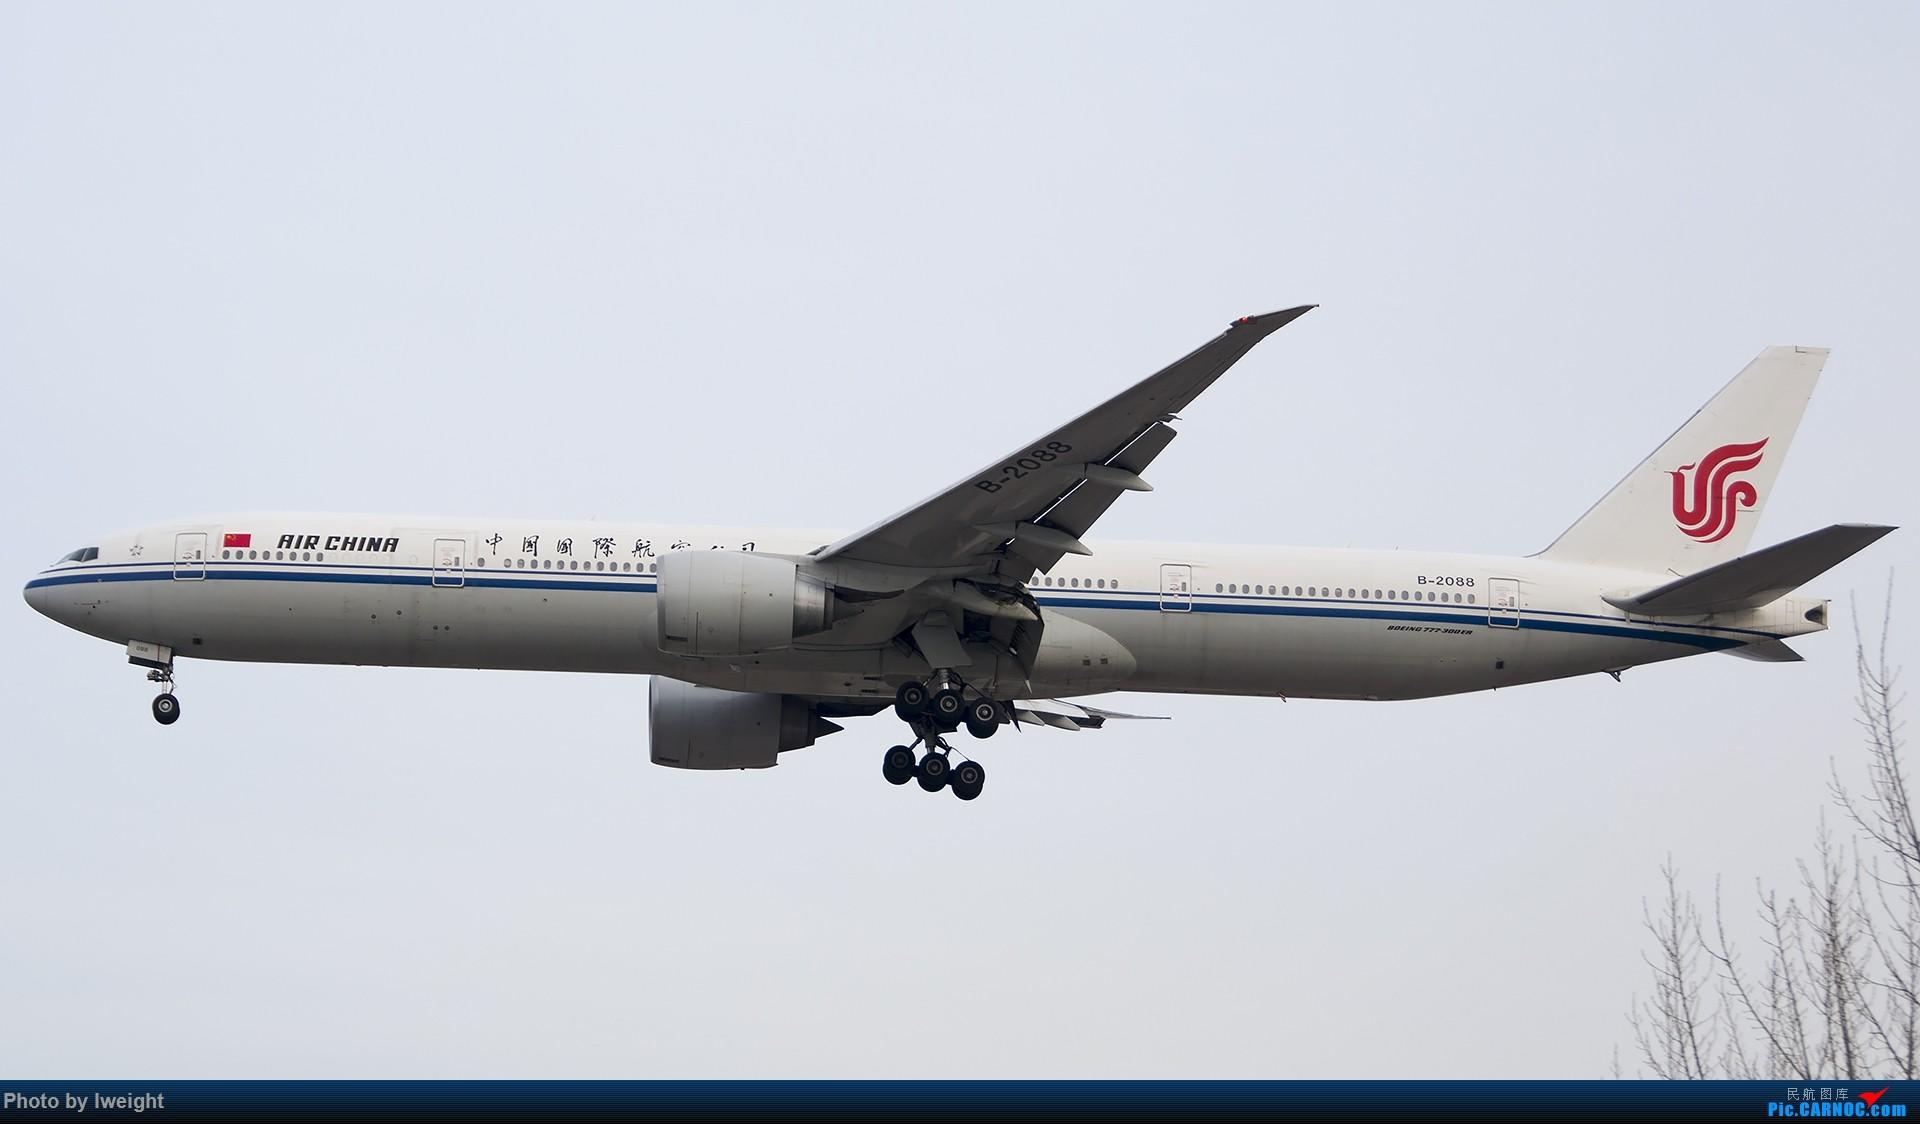 Re:[原创]2014-12-06 PEK天气由好变坏的直接体验 BOEING 777-300ER B-2088 中国北京首都国际机场